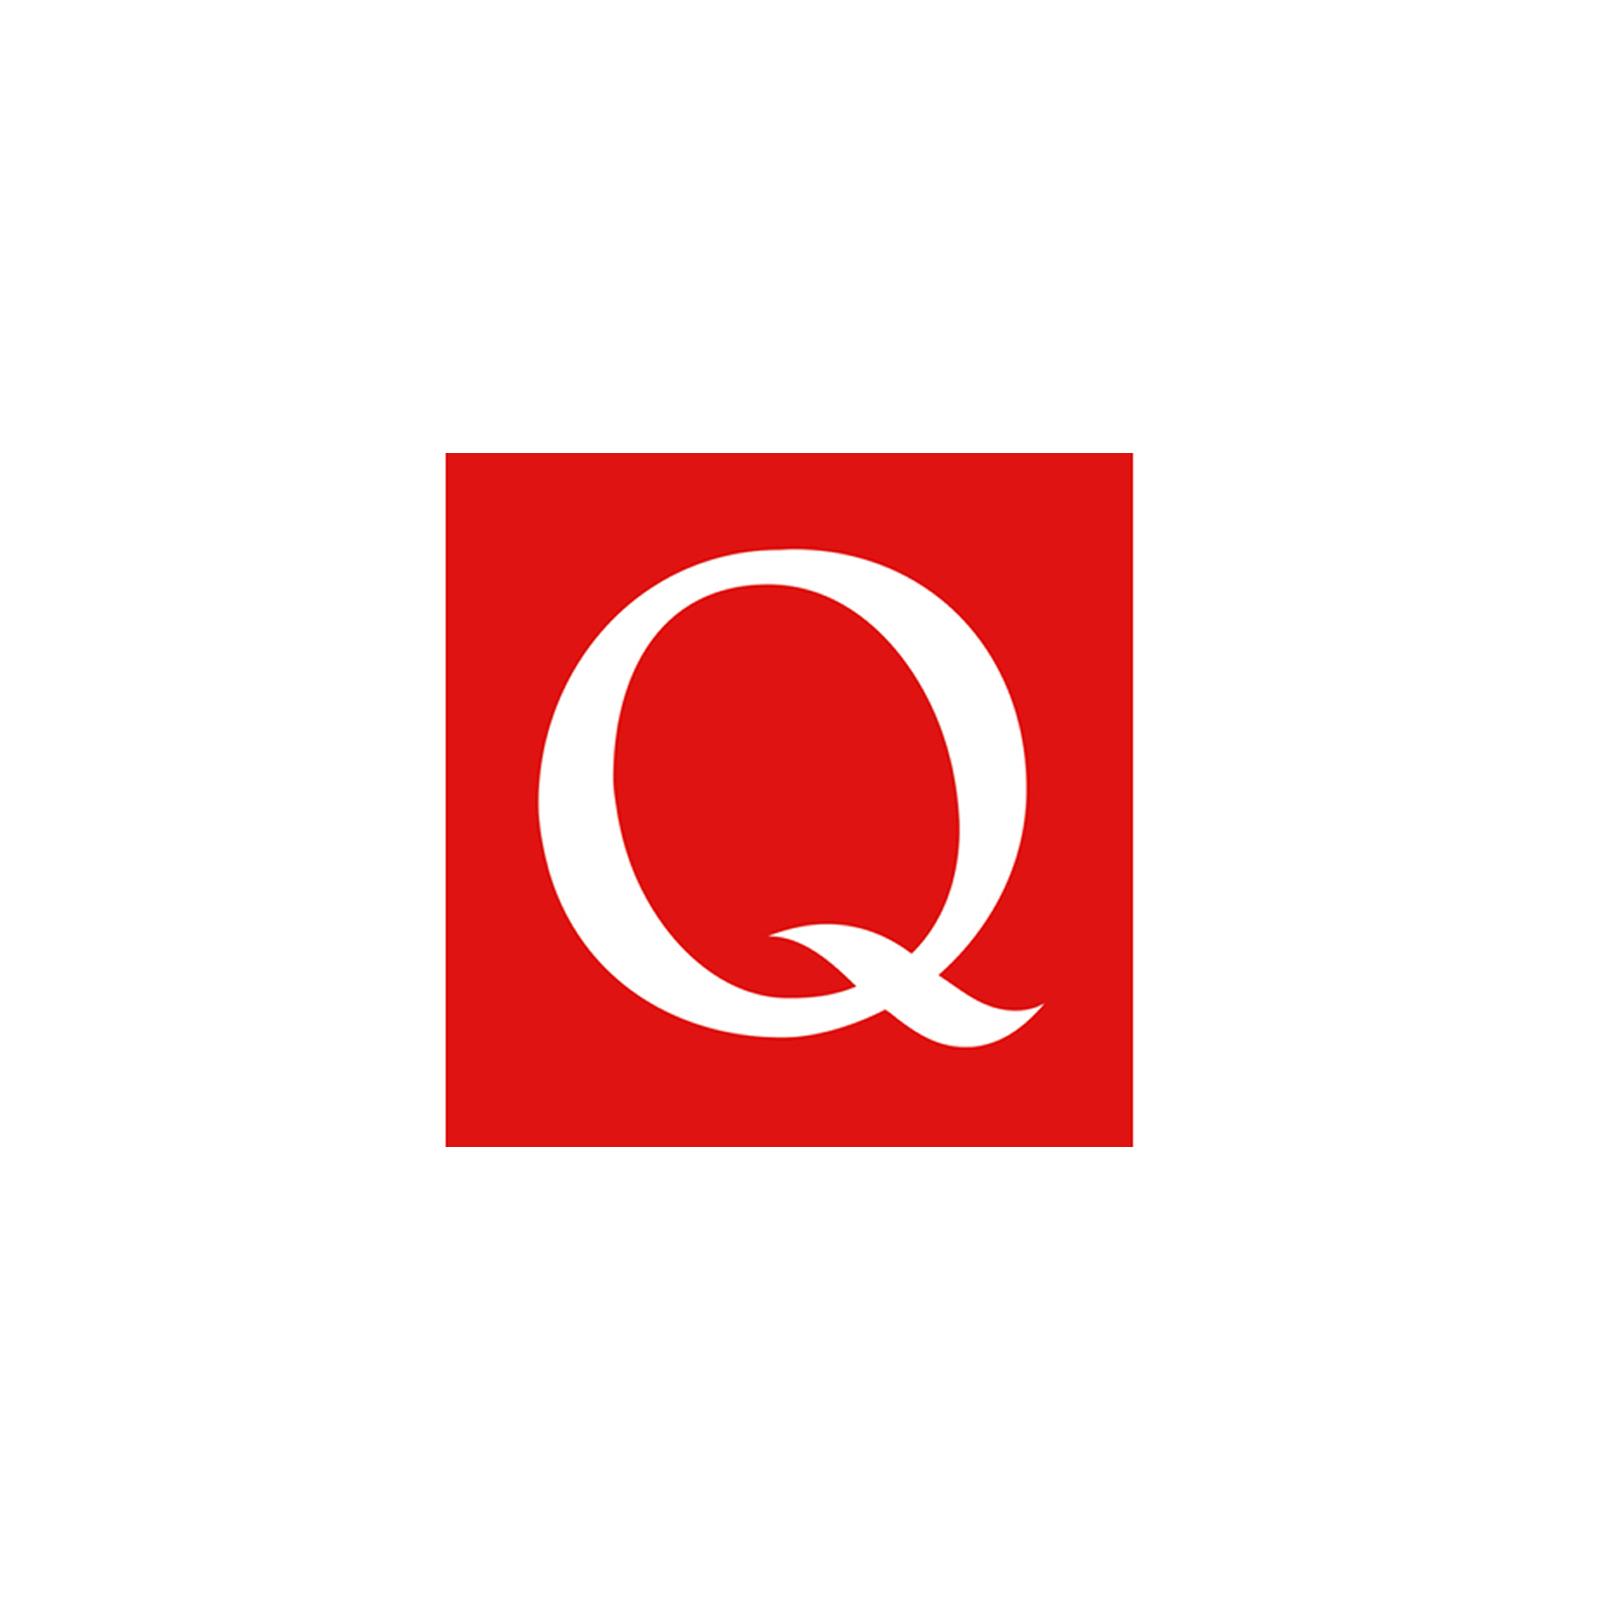 Q wards.jpg